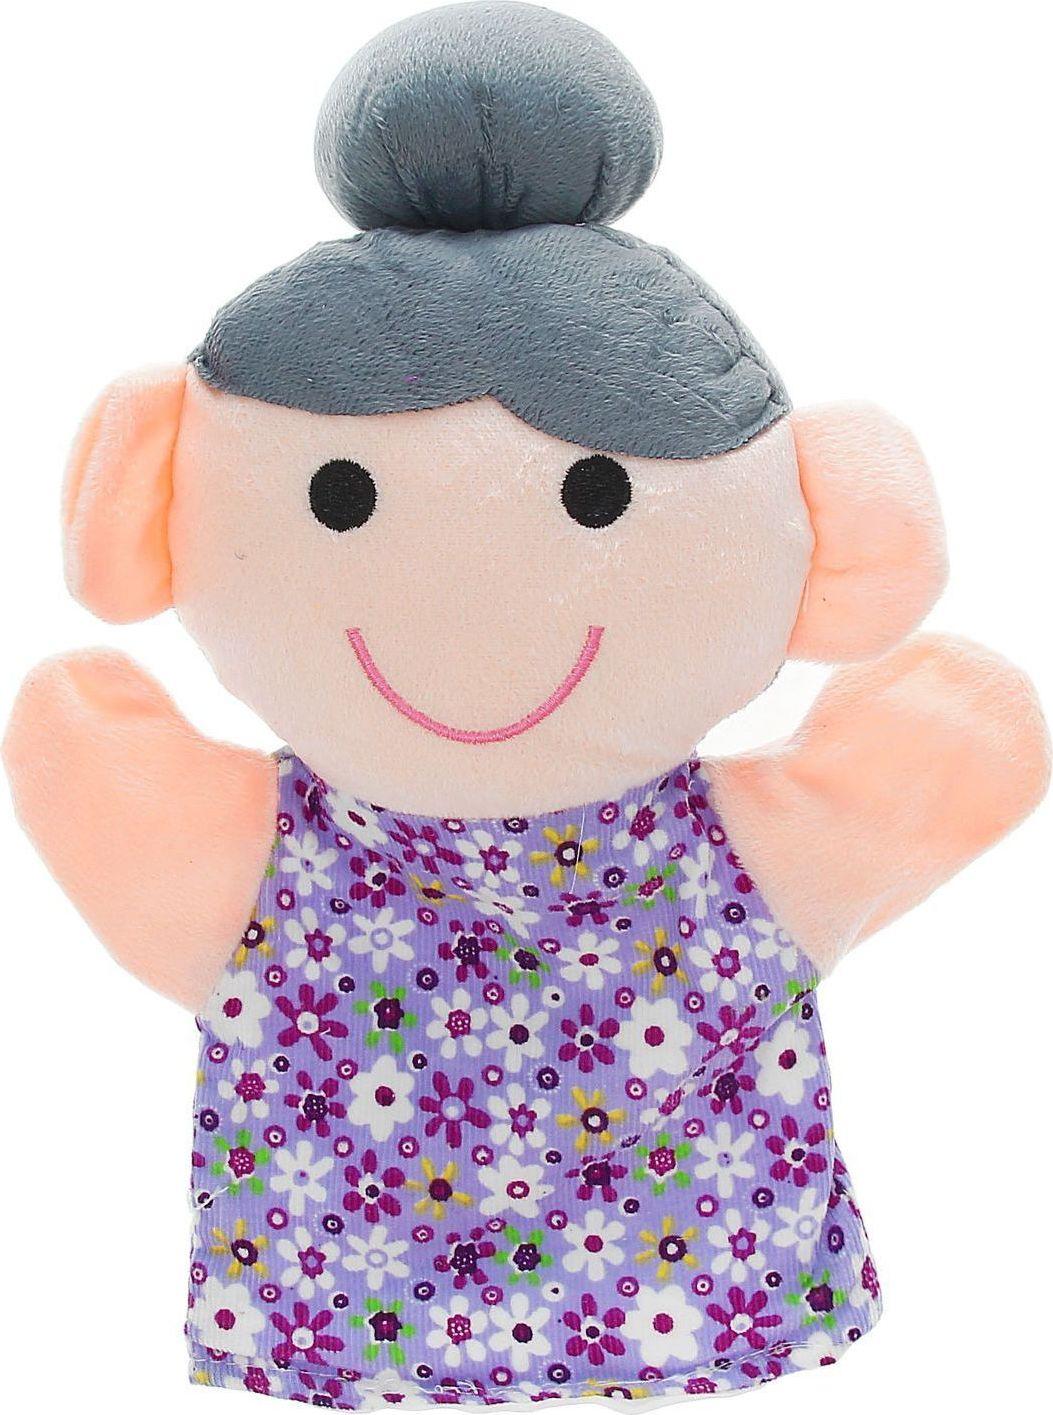 Sima-land Мягкая игрушка на руку Бабушка 1147838 sima land мягкая игрушка на руку заяц 506986